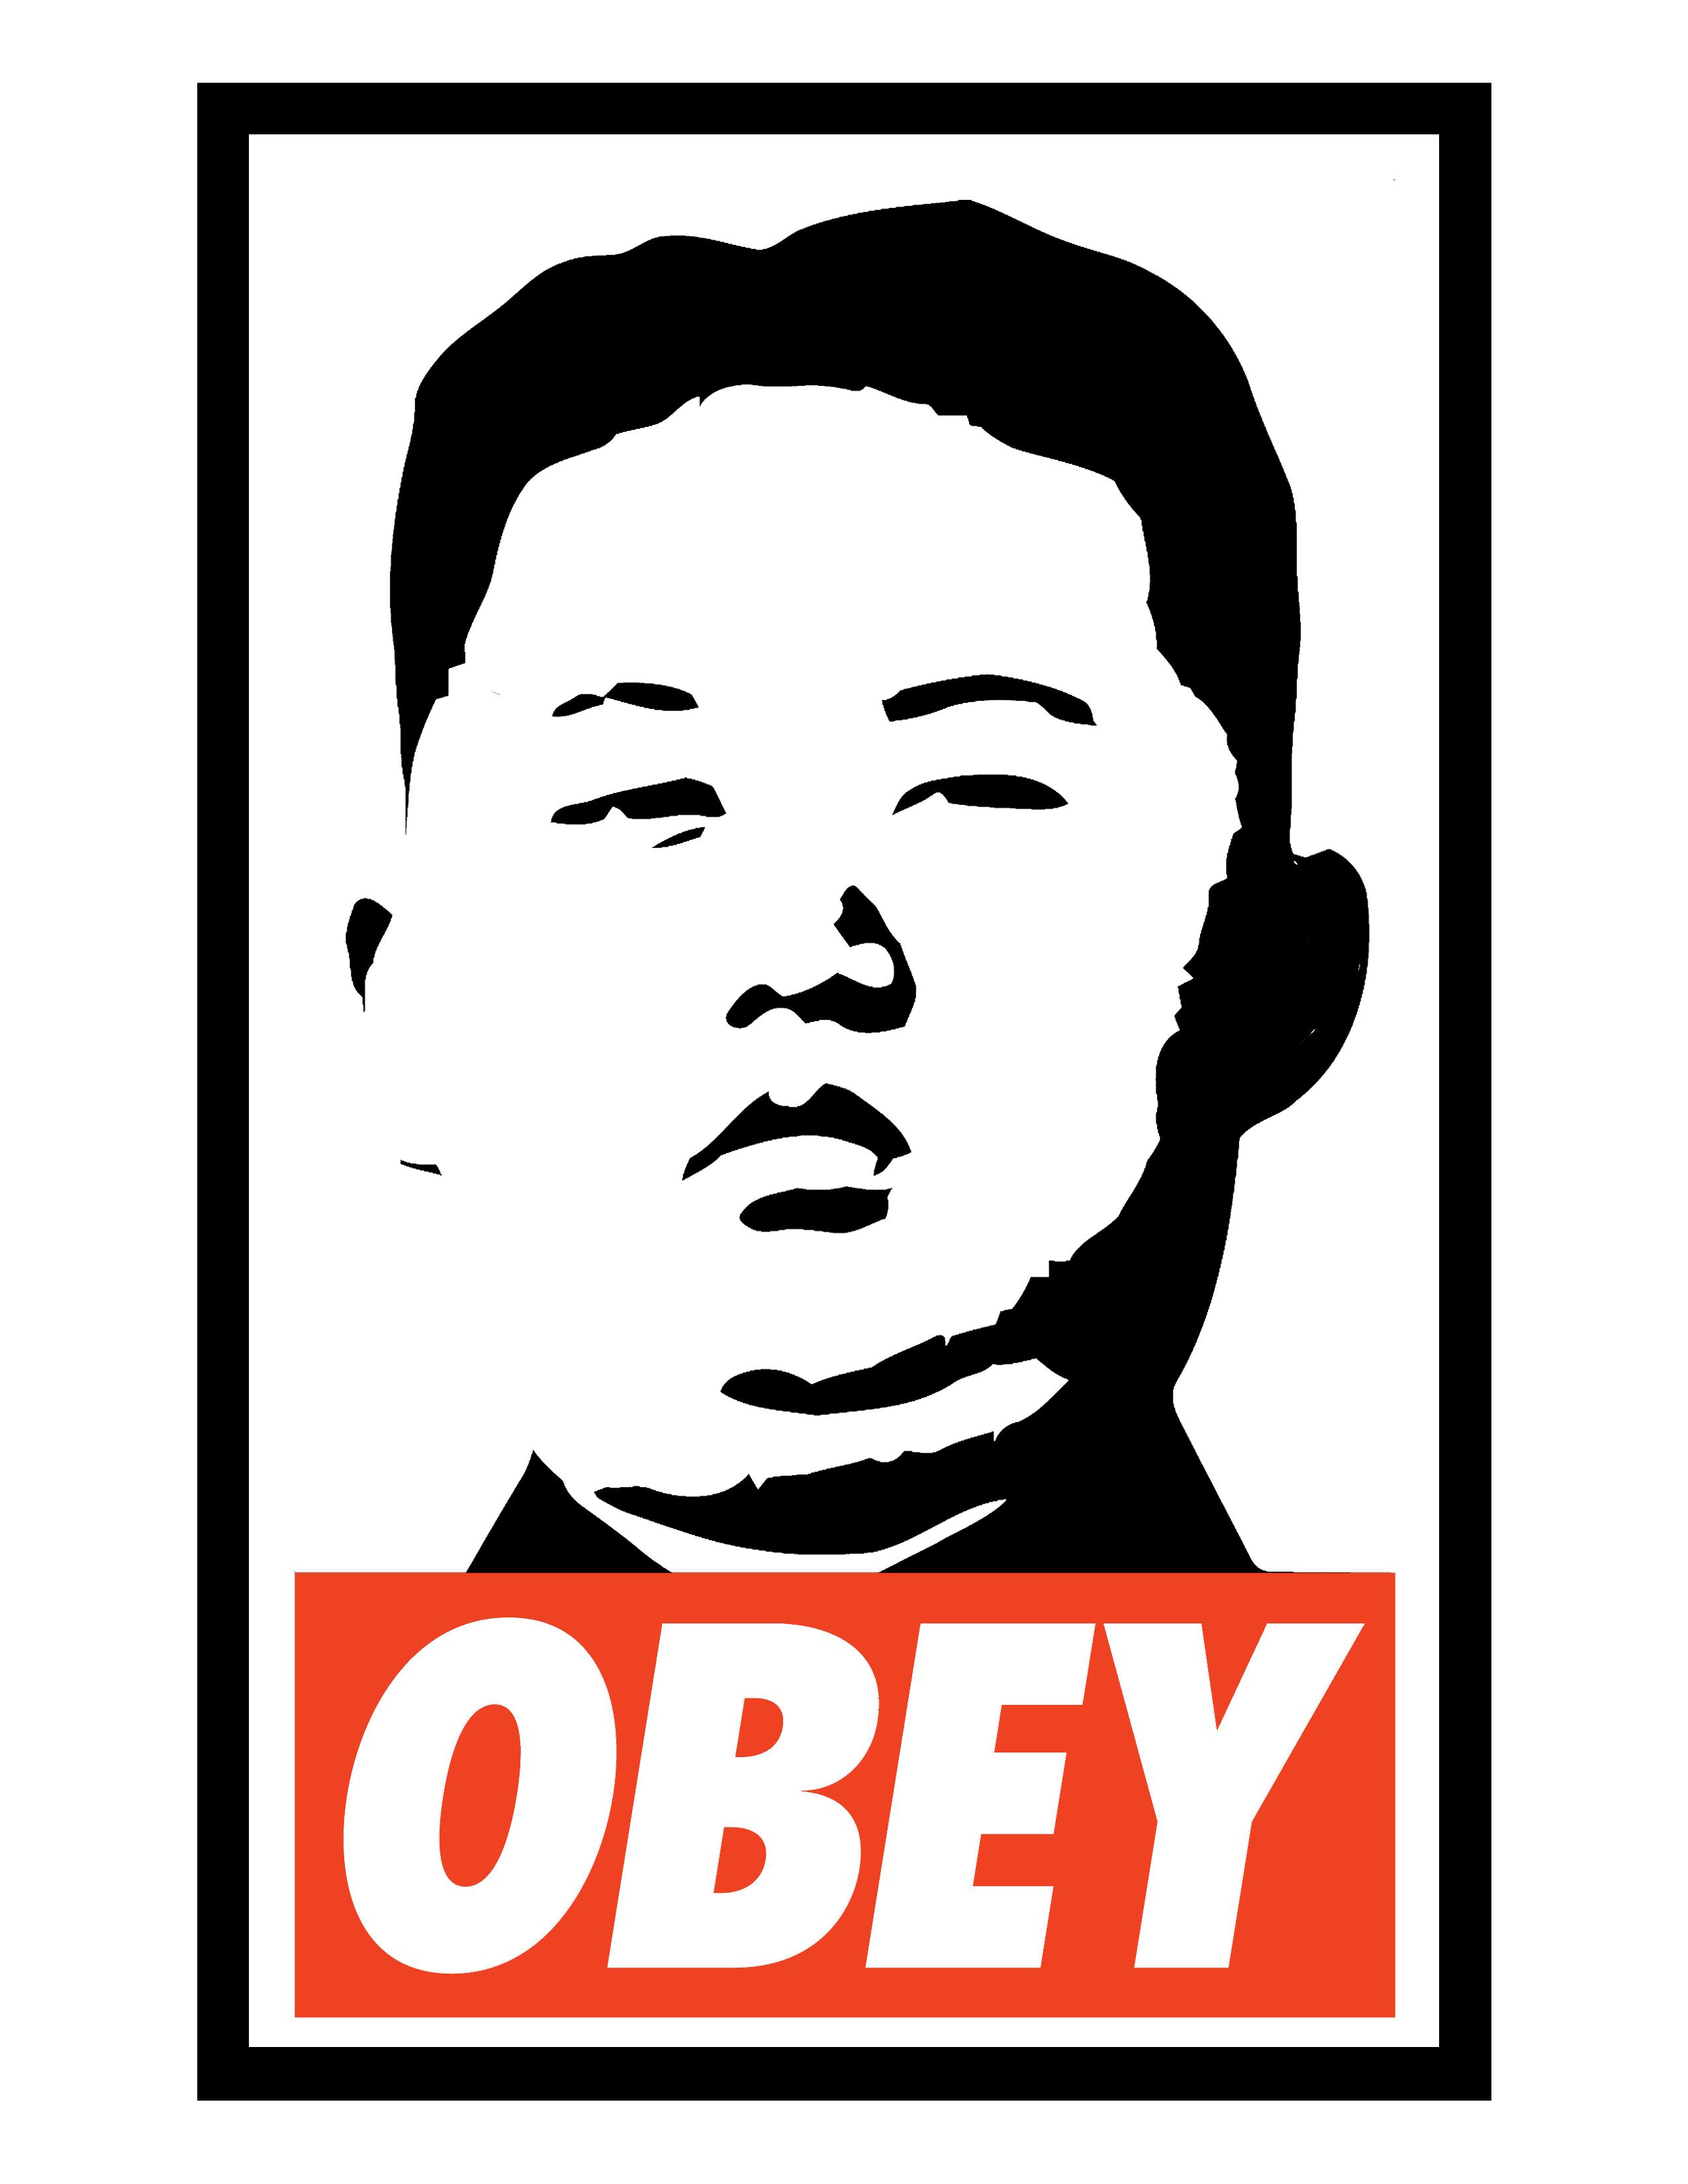 OBEY. oc. oc obey admin